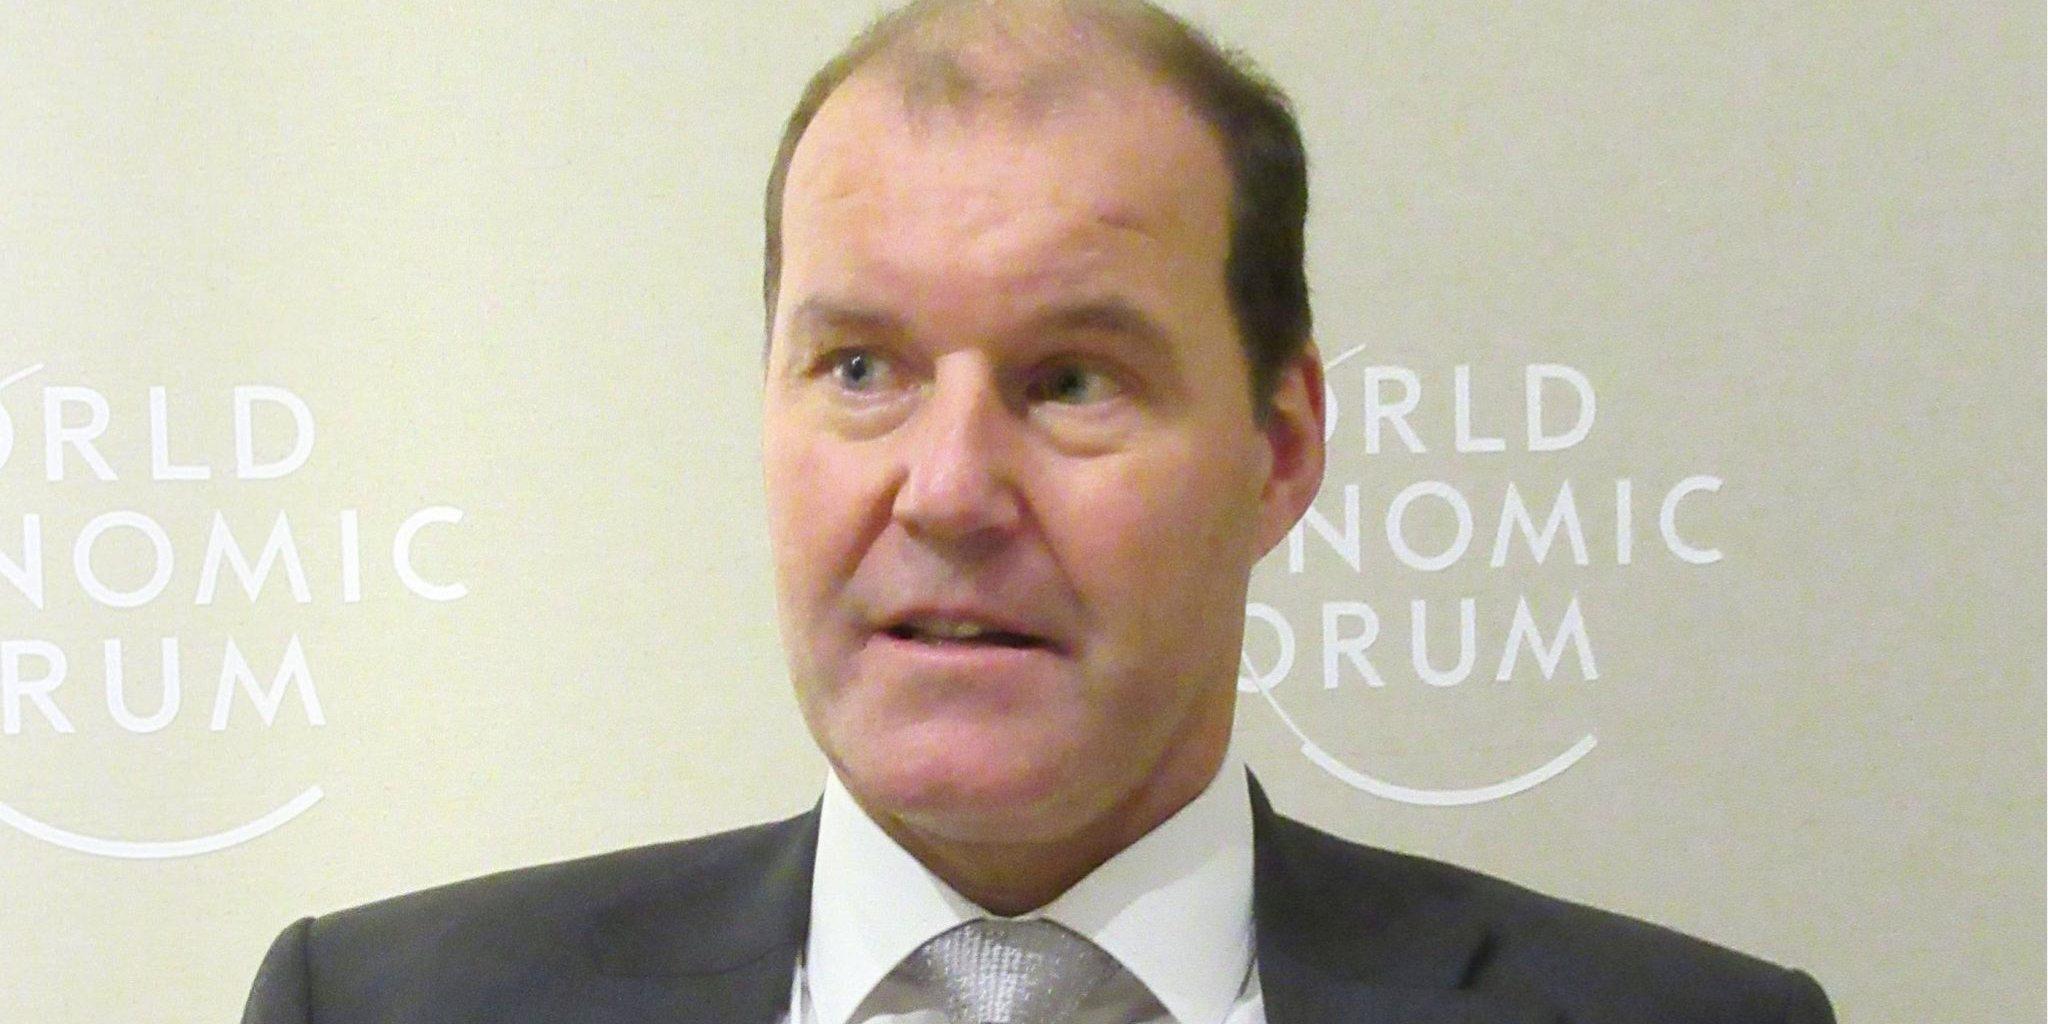 Shire Rejects $60 Billion Bid From Takeda